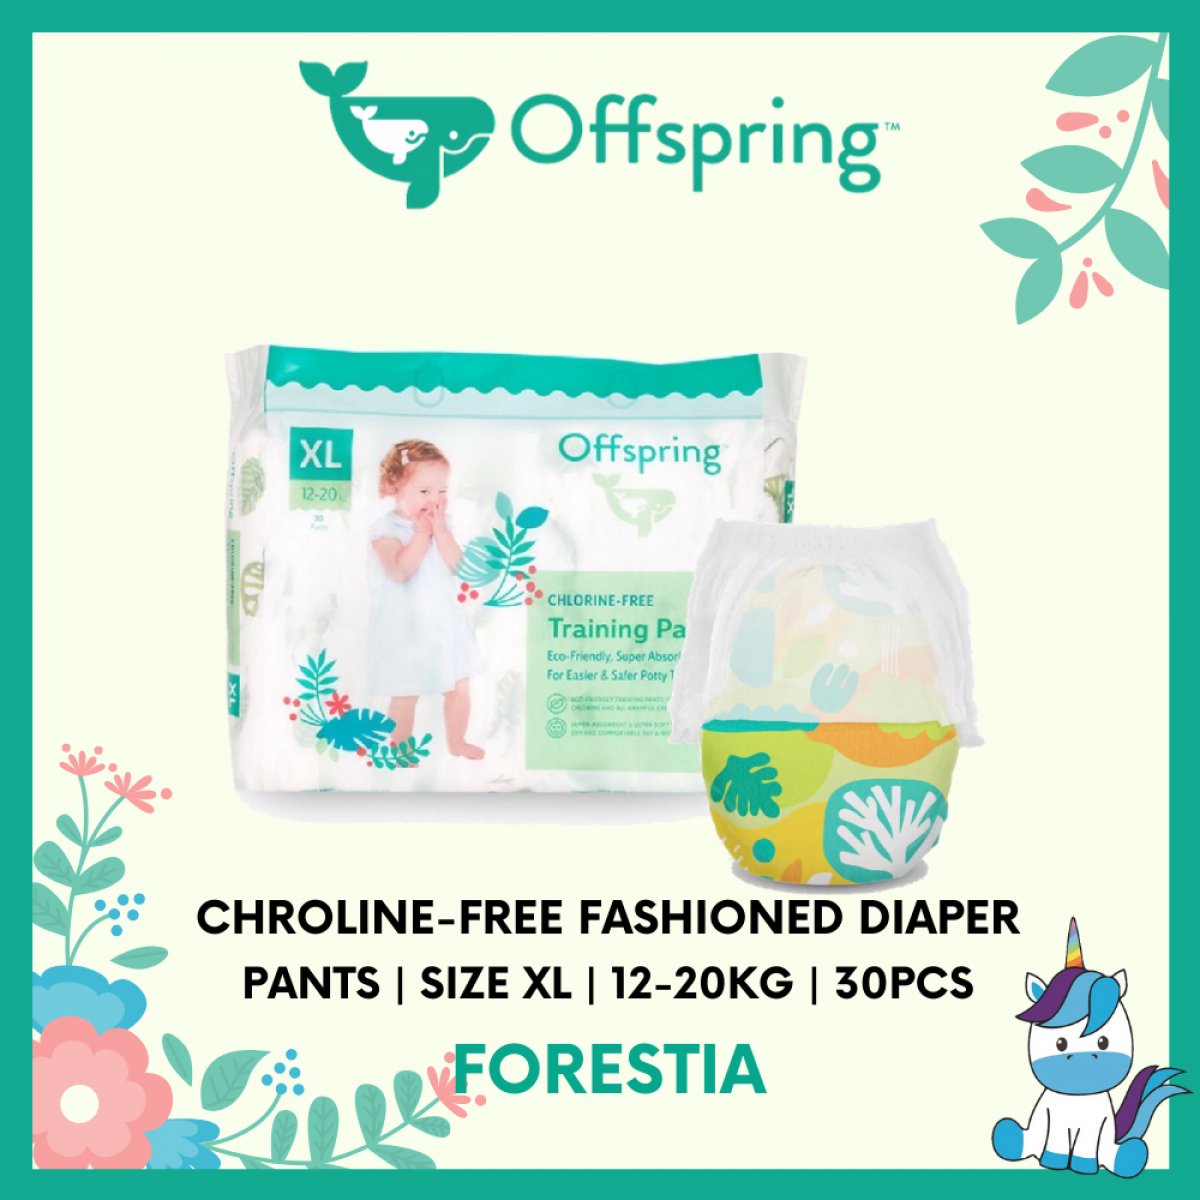 Offspring Chroline-Free Fashioned Pants Diaper XL 30pcs